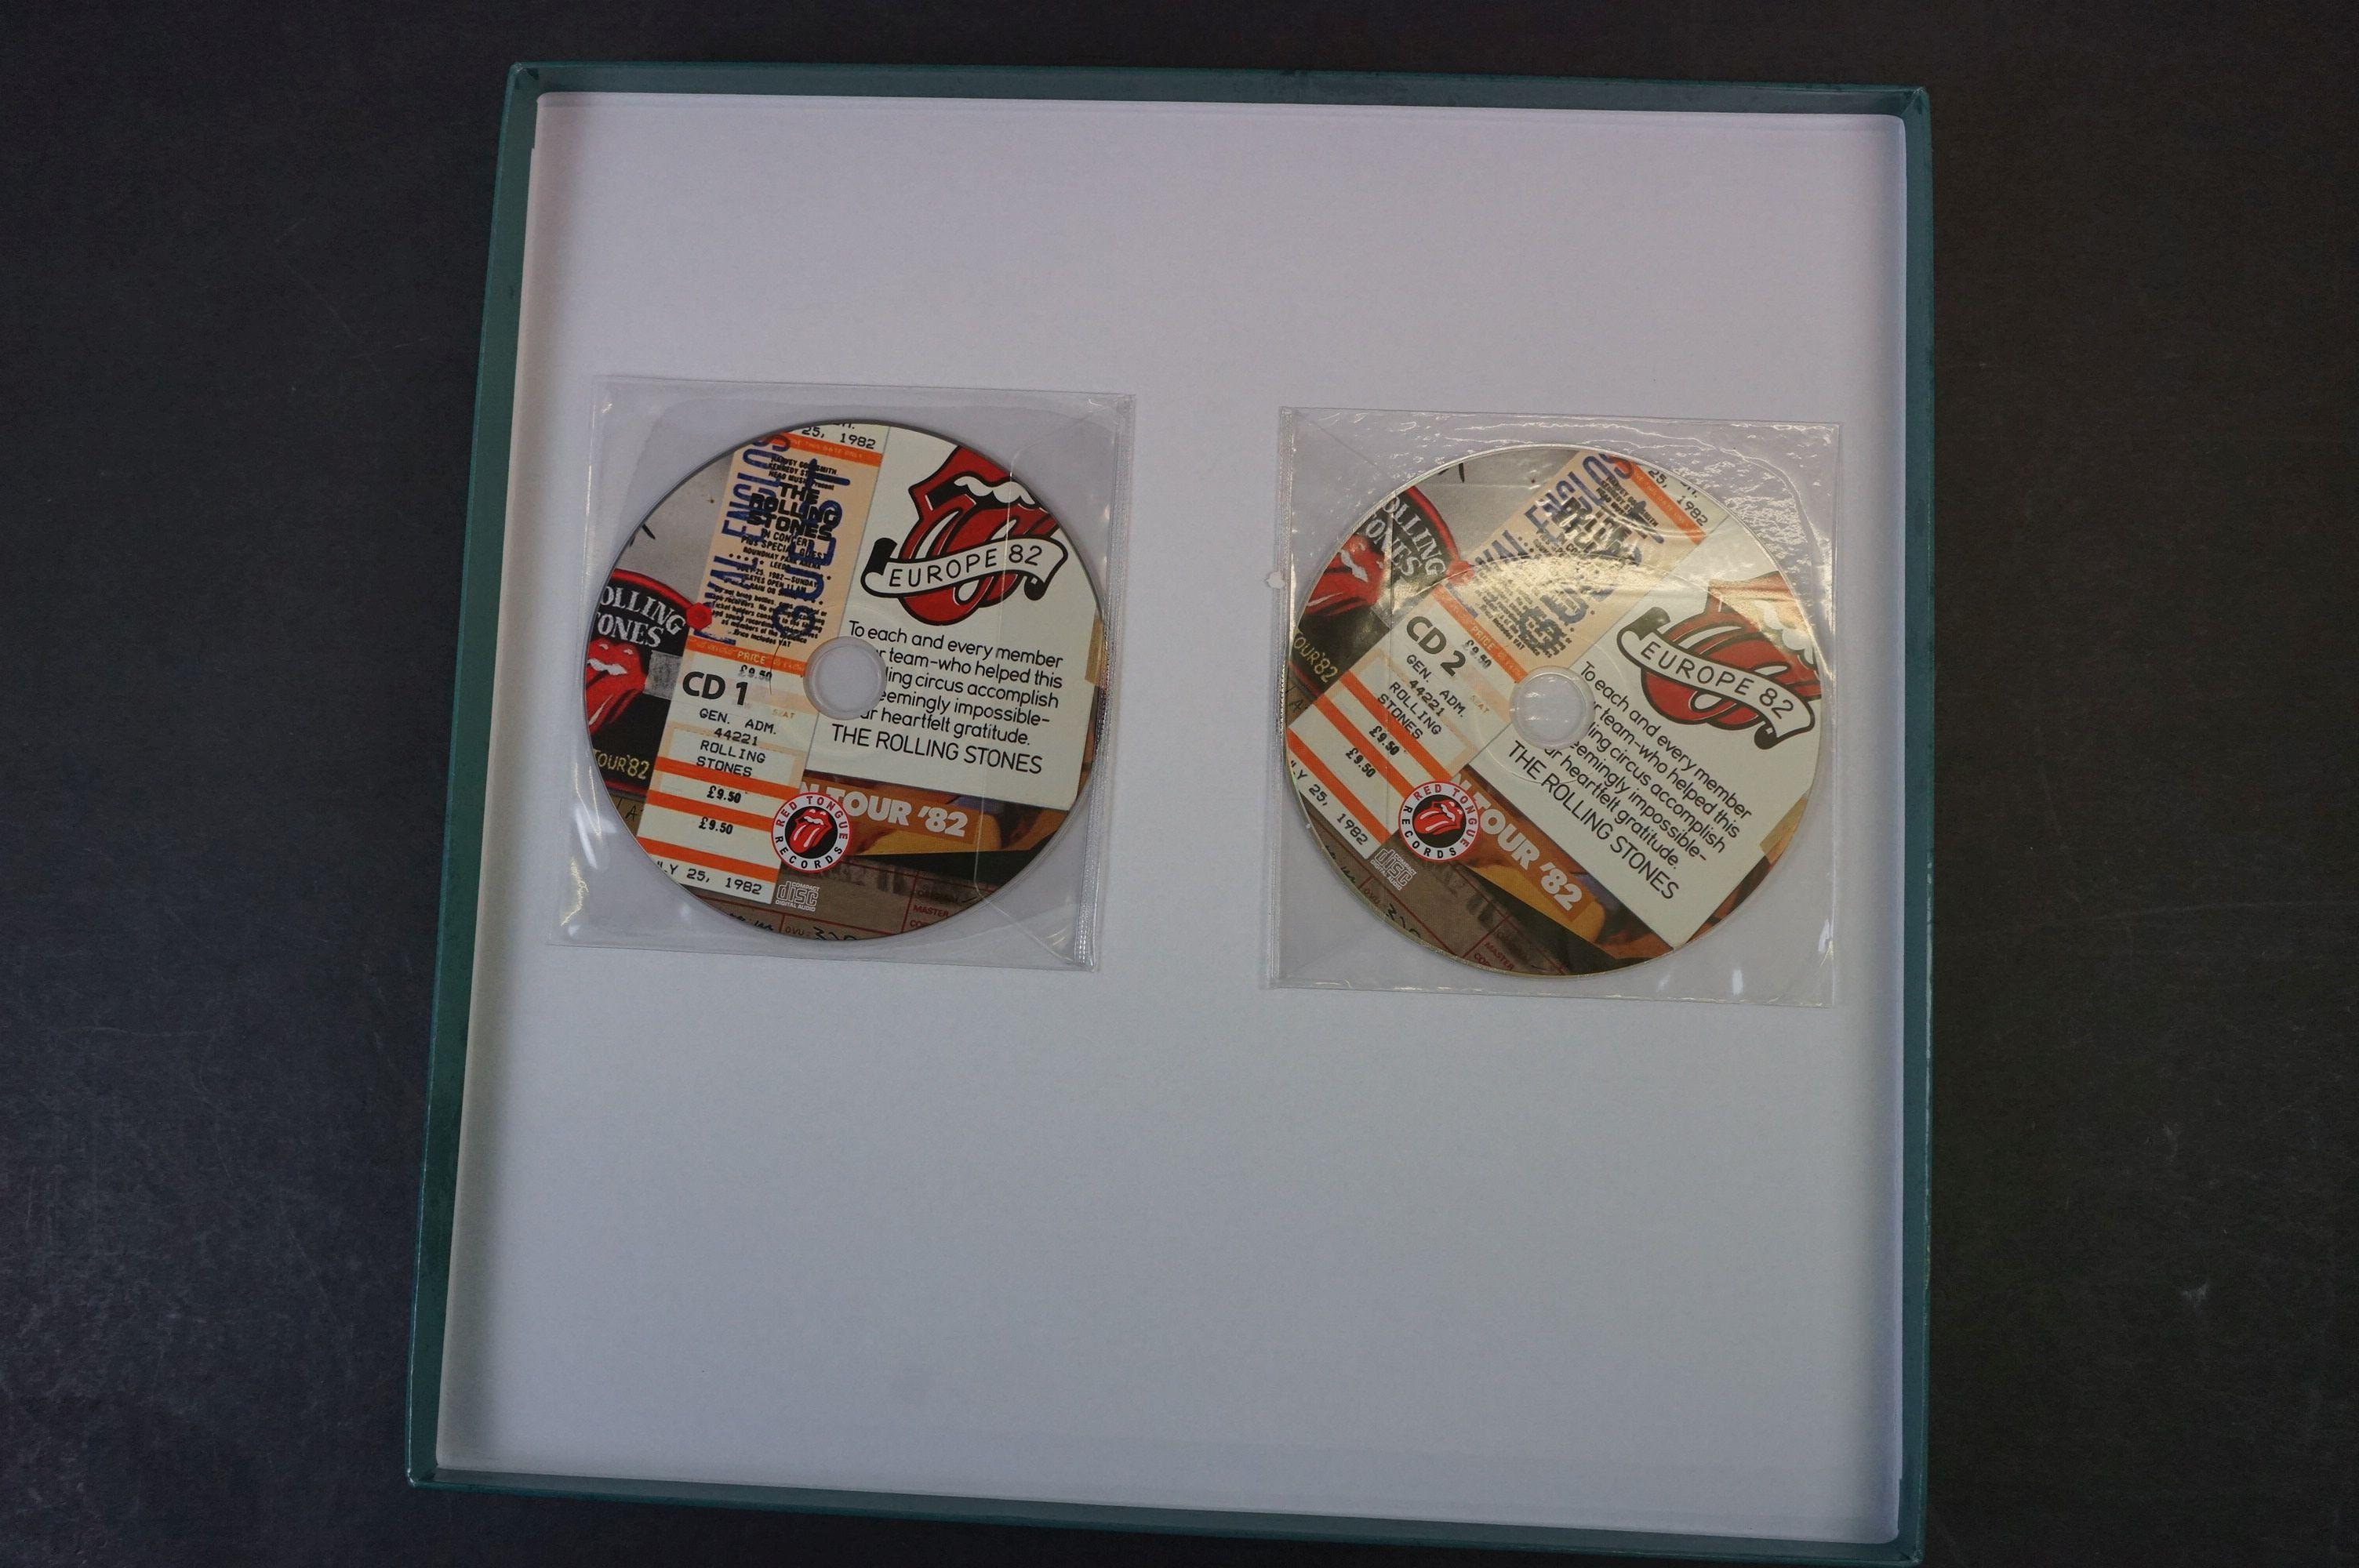 Vinyl - ltd edn The Real Alternate Album Rolling Stones Leeds July 25 1982 3 LP / 2 CD Box Set RTR - Image 2 of 10